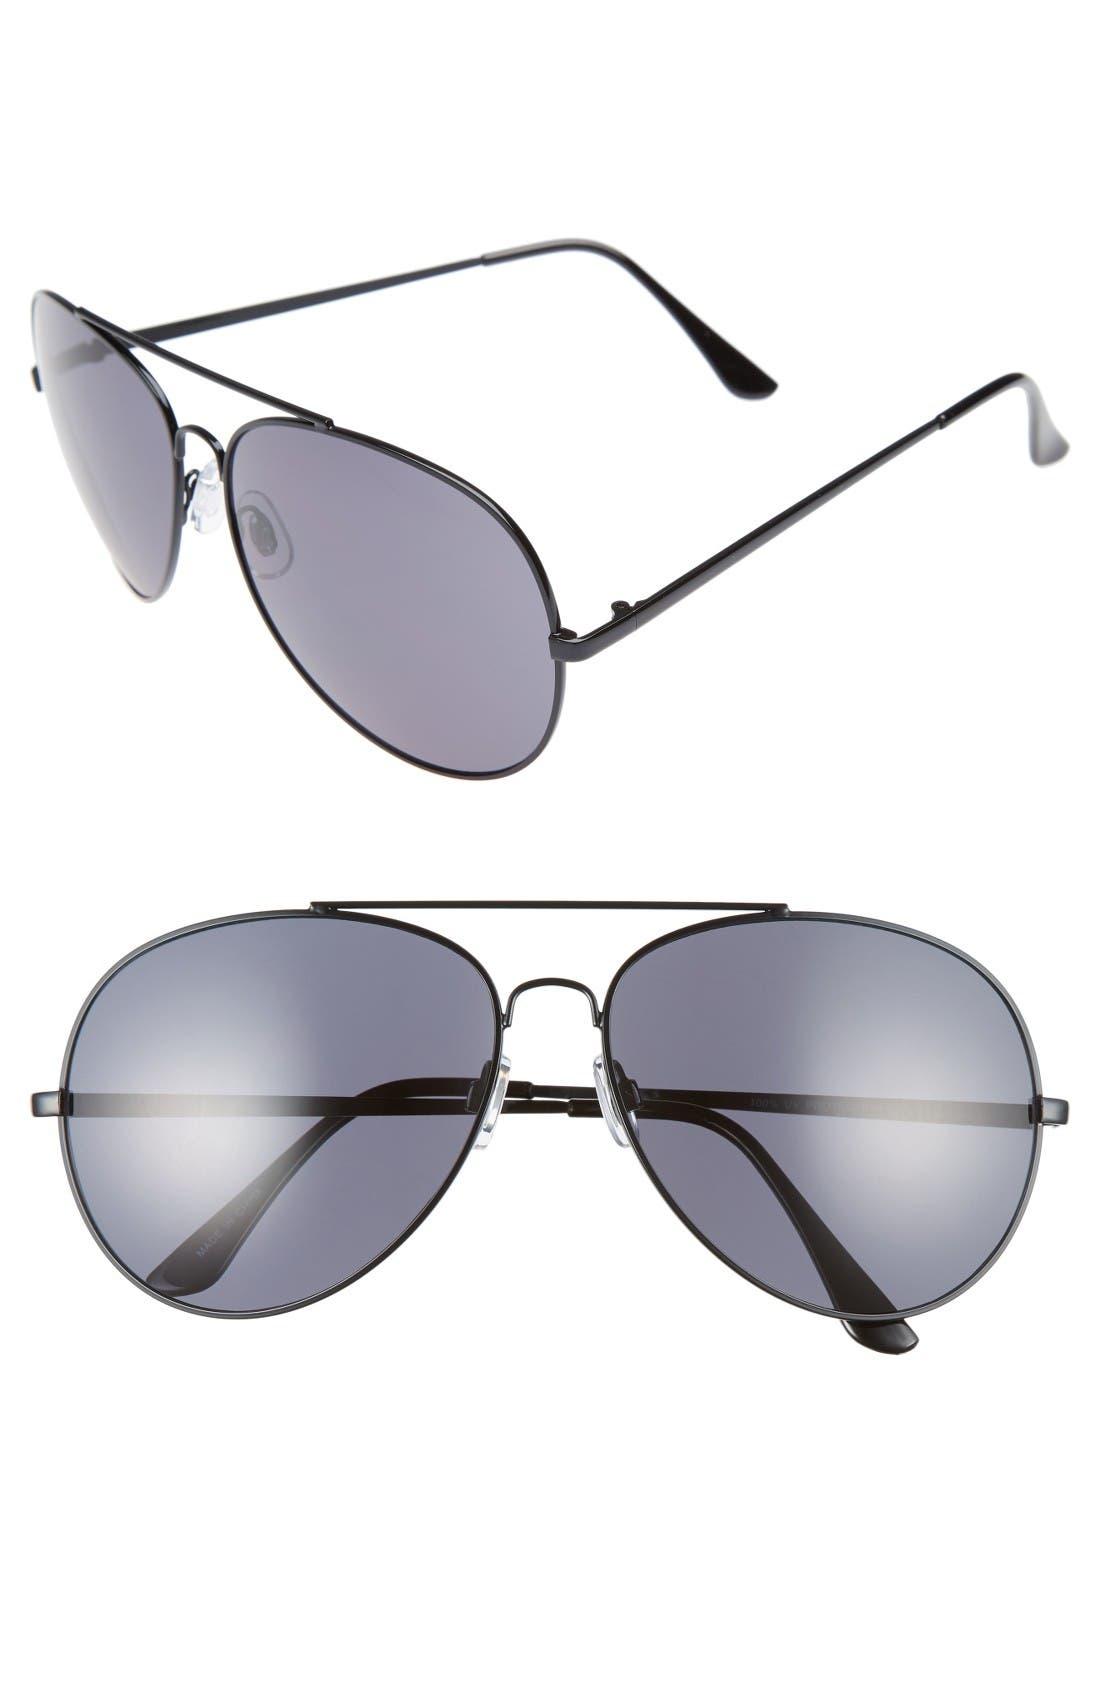 65mm Oversize Aviator Sunglasses,                         Main,                         color, Black/ Black